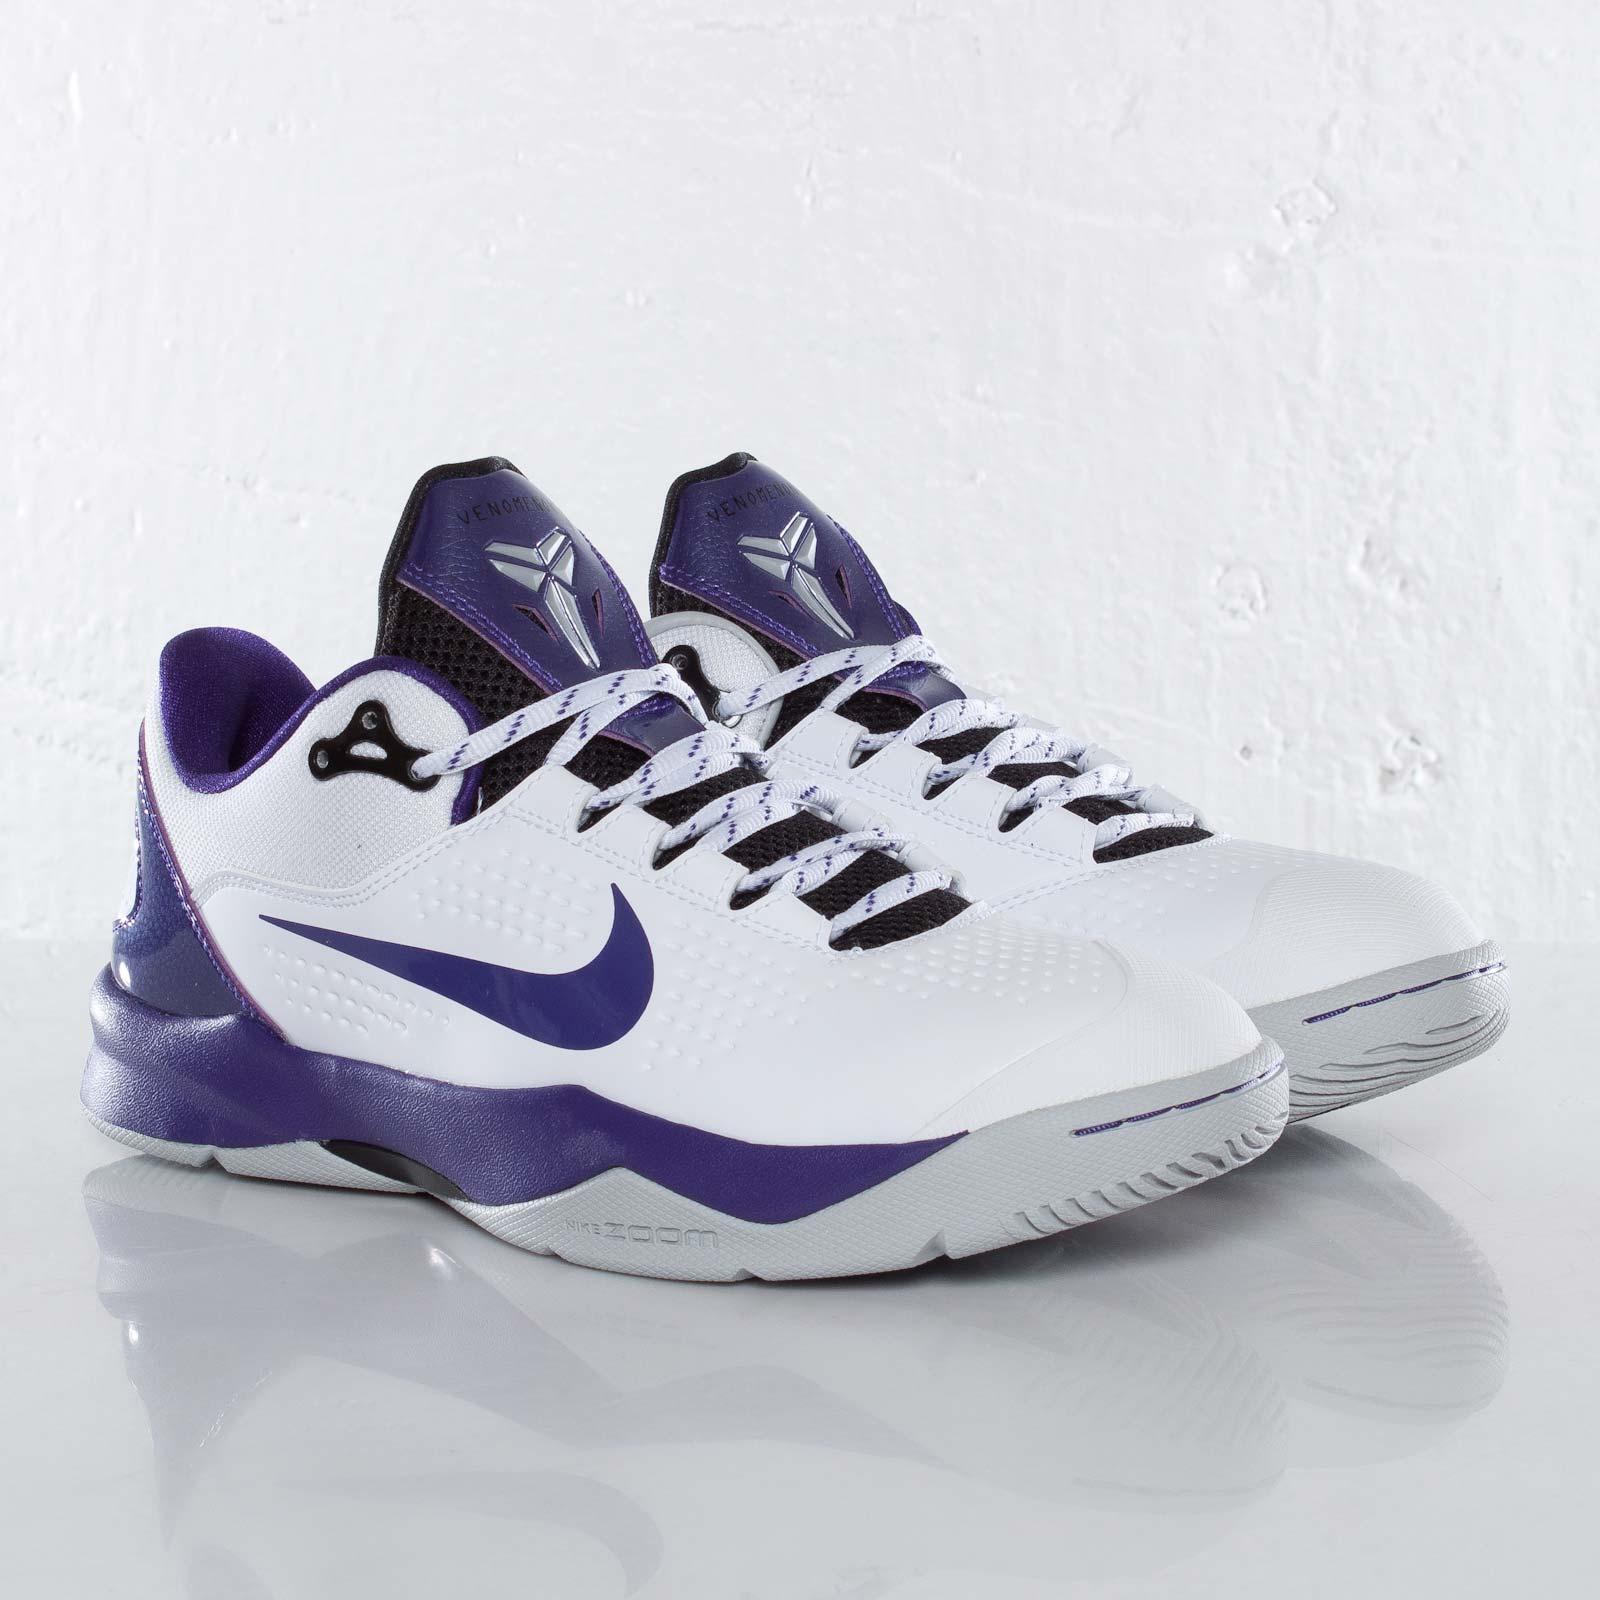 1b339aefa39 Nike Zoom Kobe Venomenon 3 - 555073-100 - Sneakersnstuff